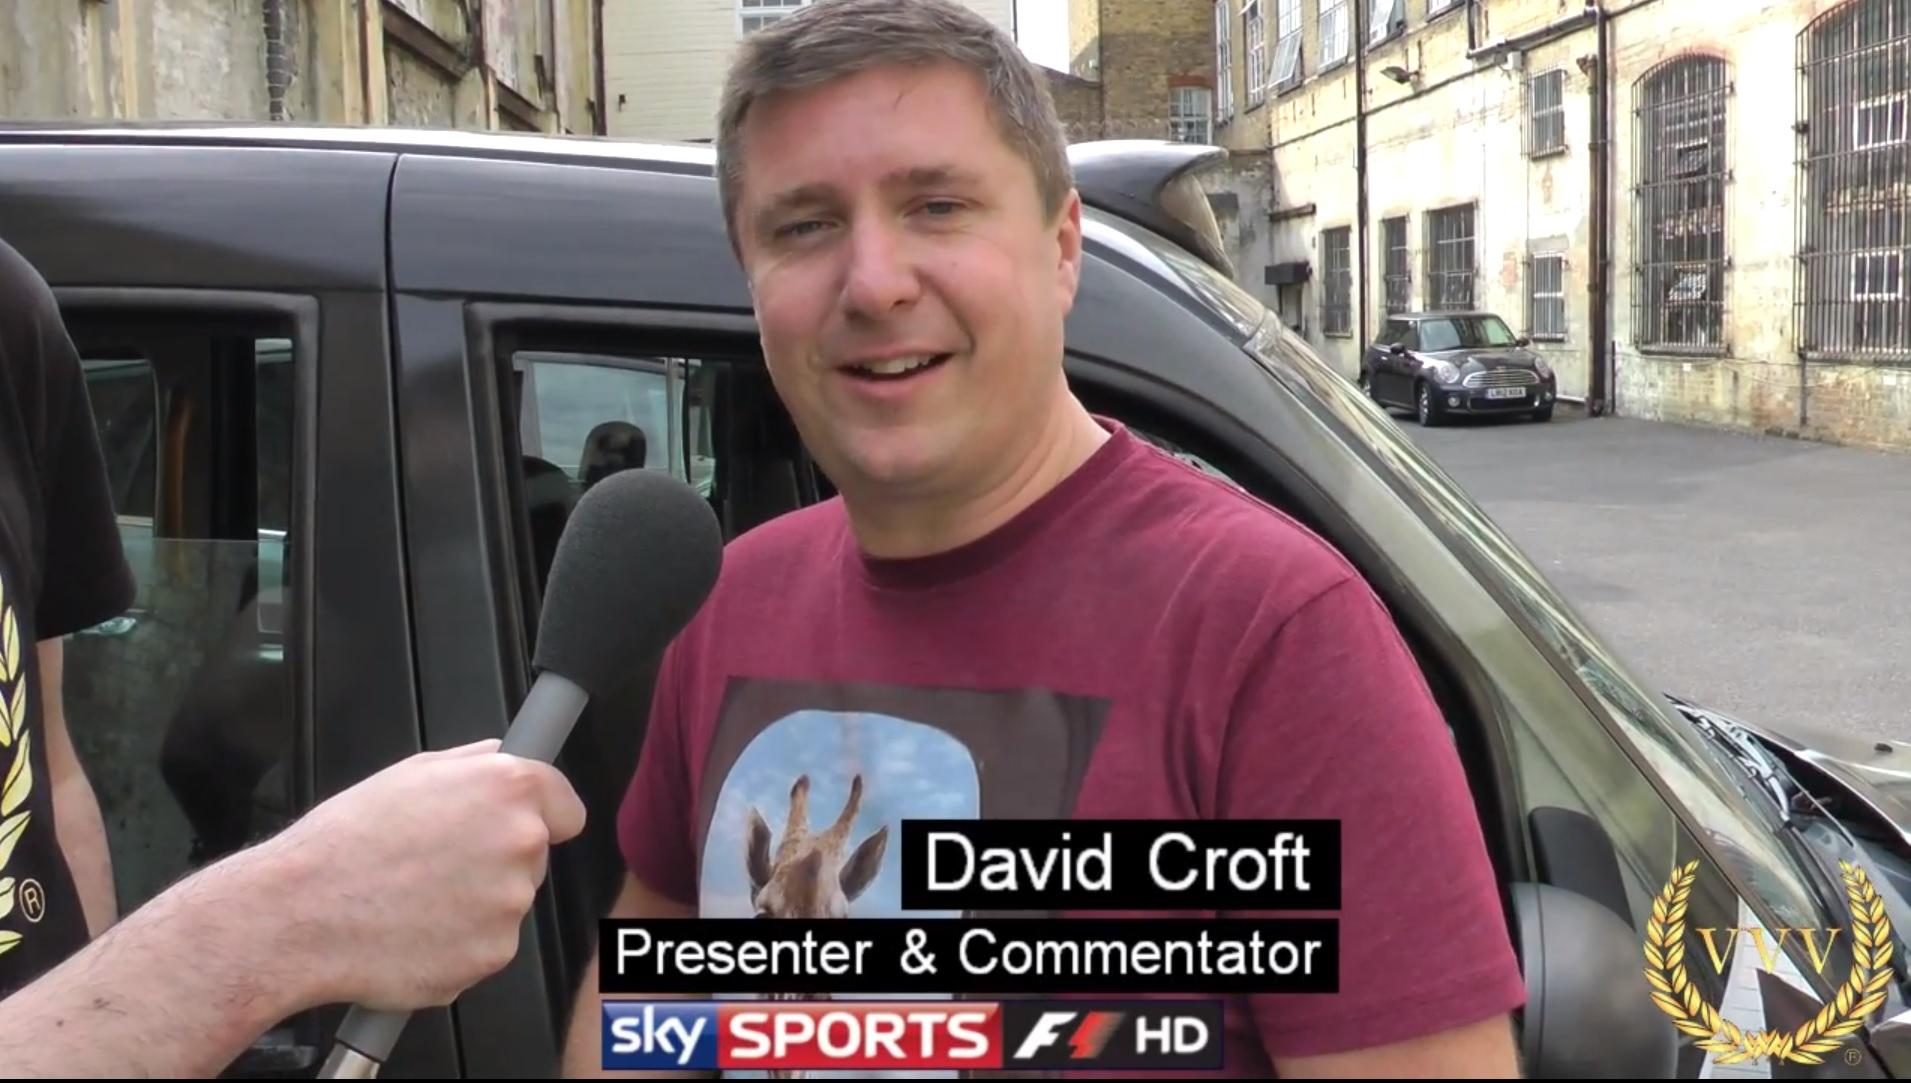 Alan interviews F1 commentator David Croft